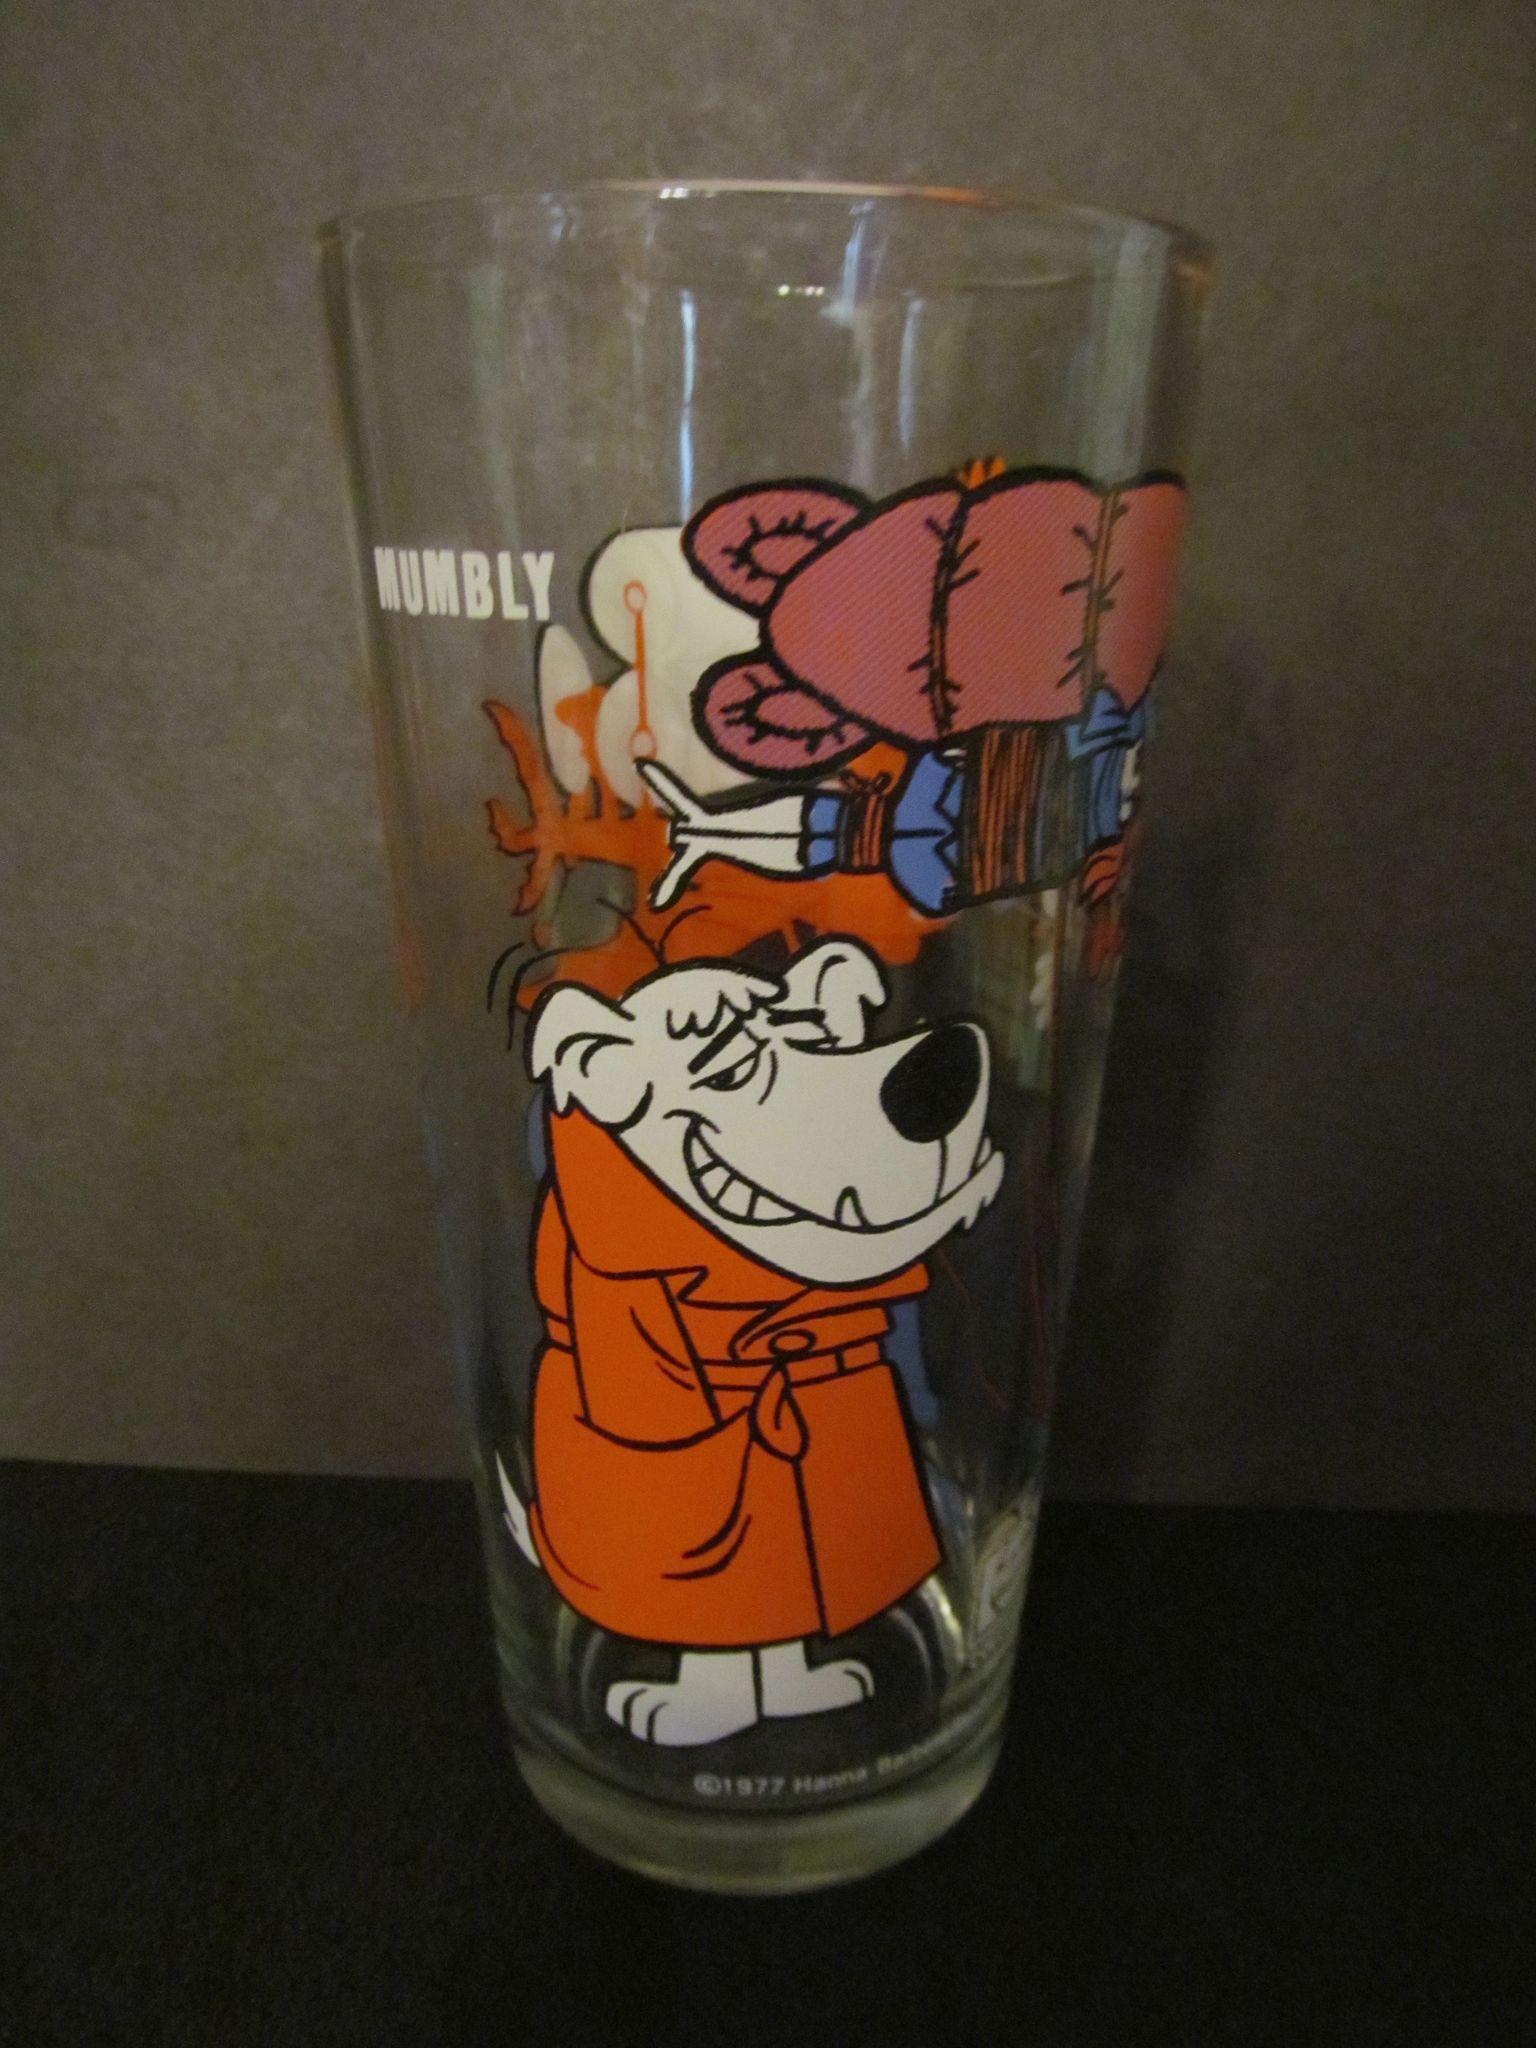 1977 Mumbly, Warner Bros Pepsi Glass